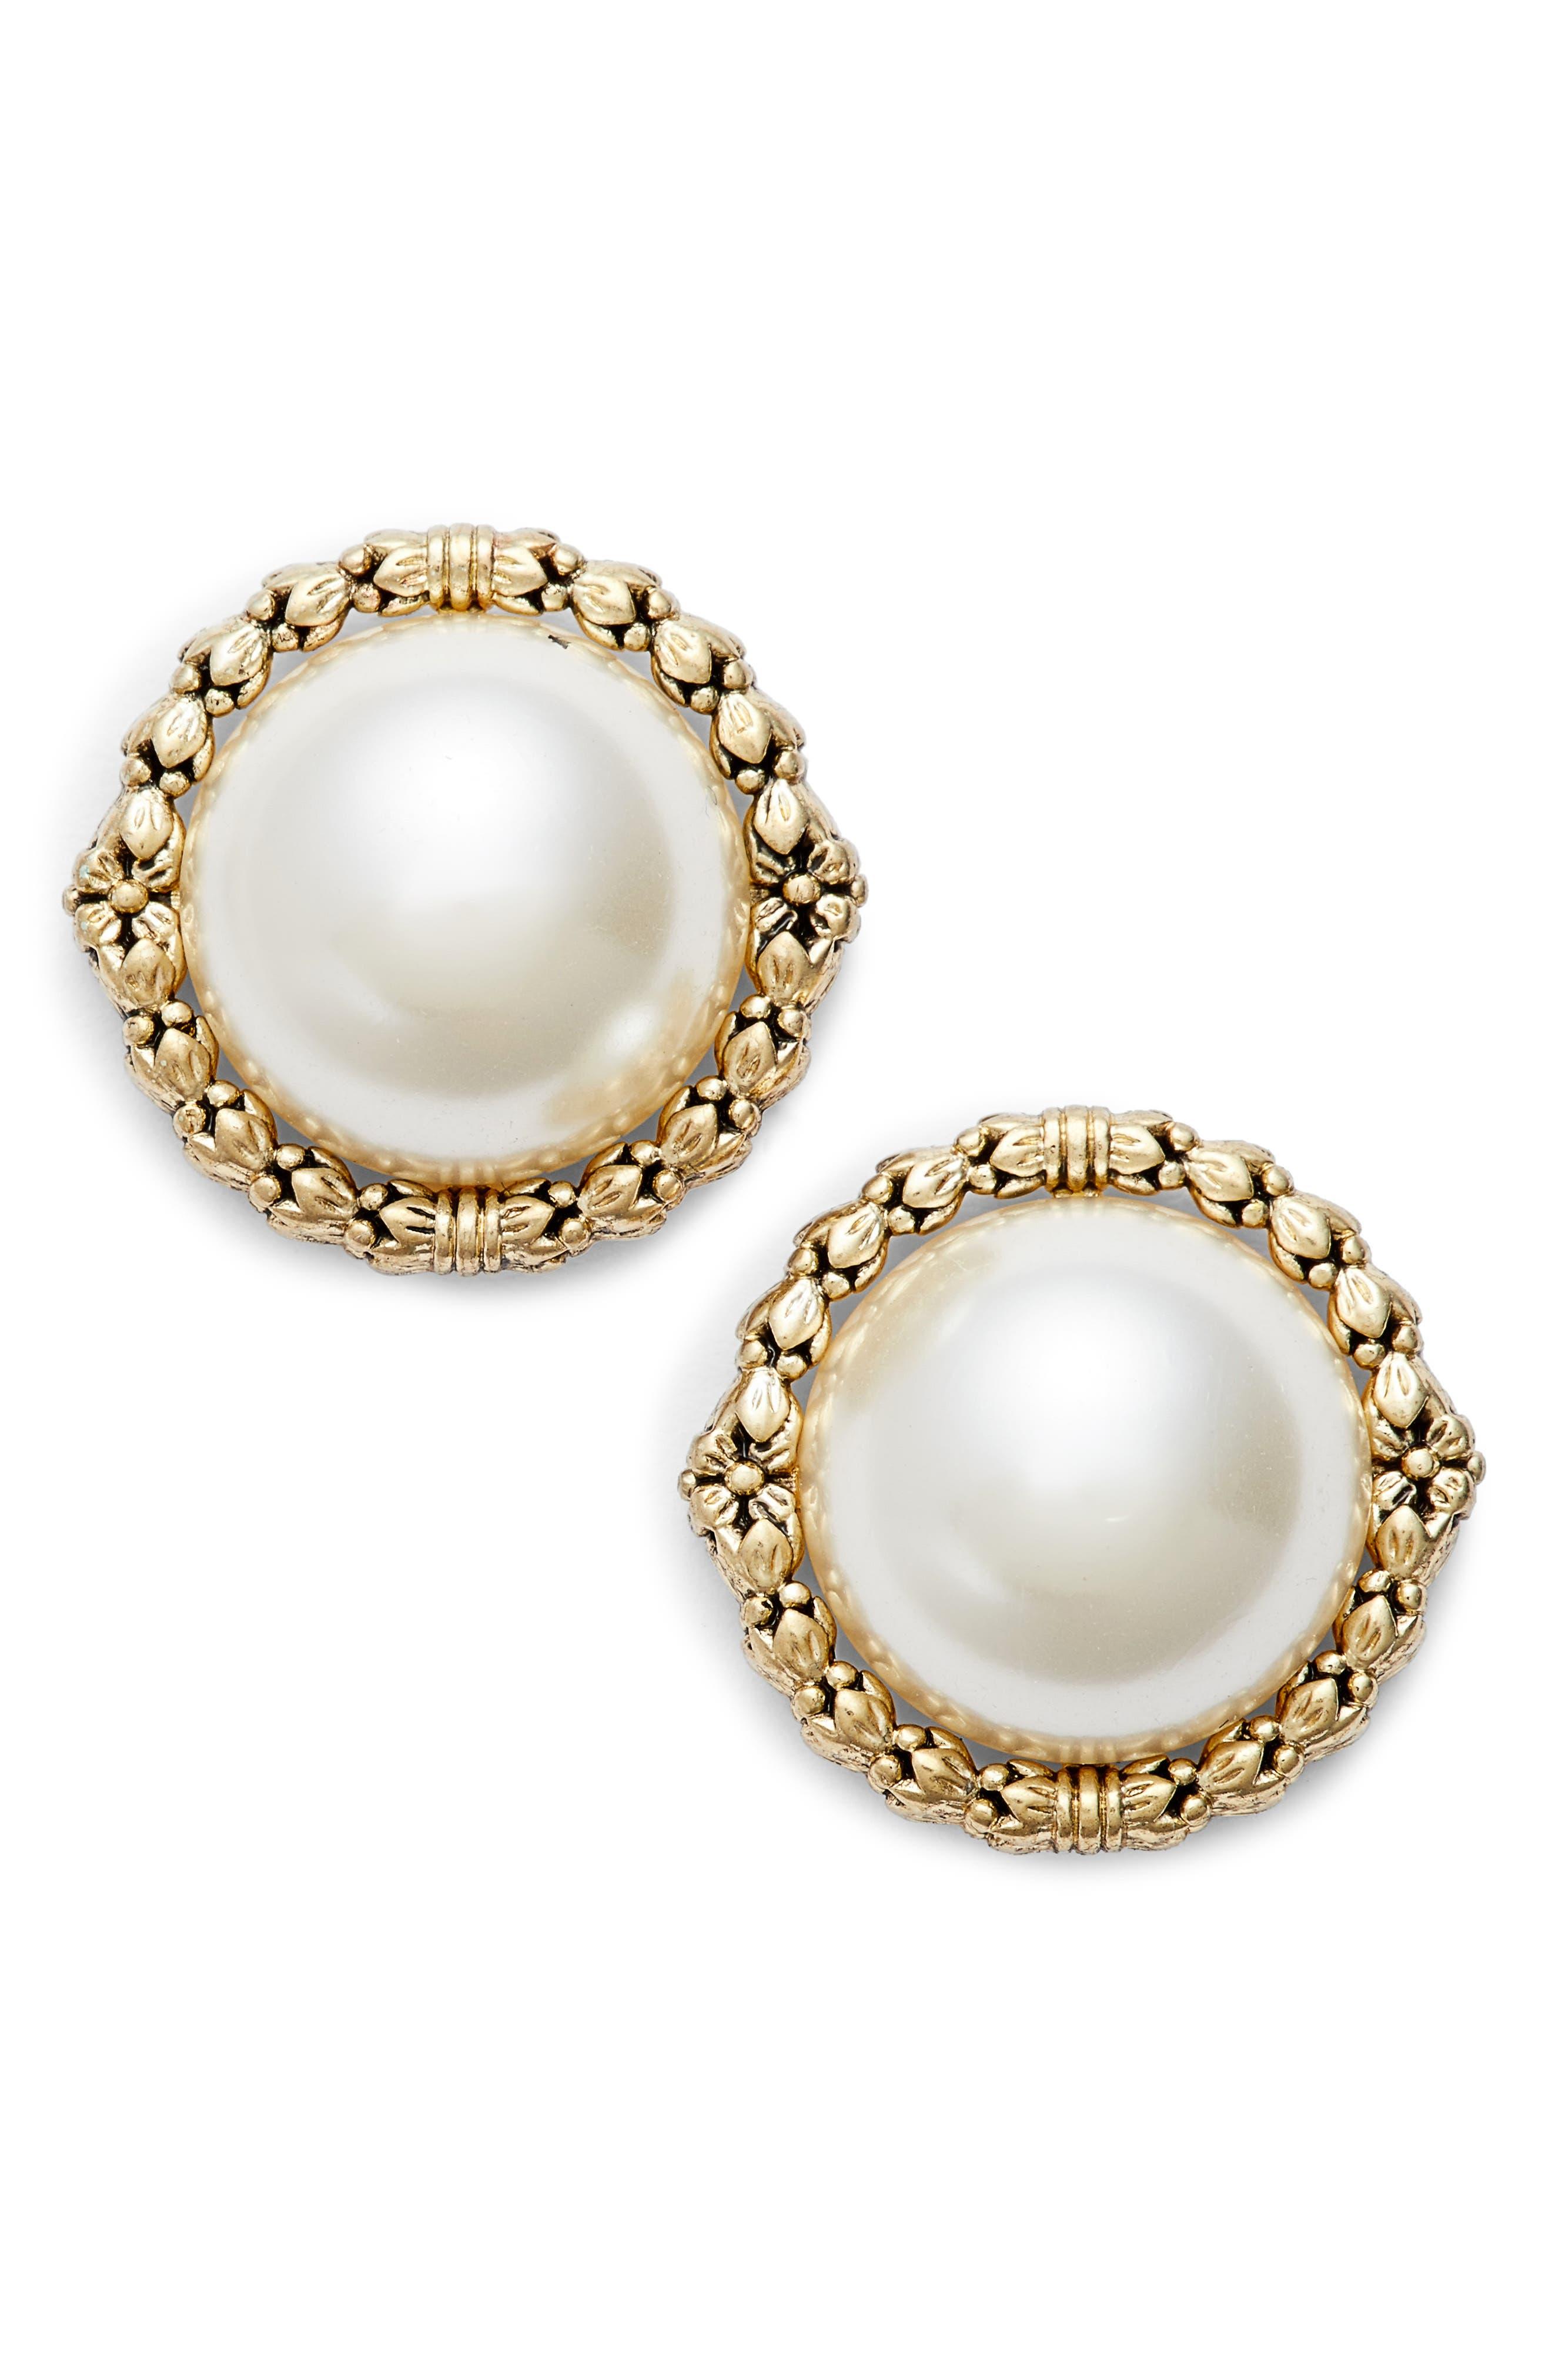 Jenny Packham Imitation Pearl Stud Earrings